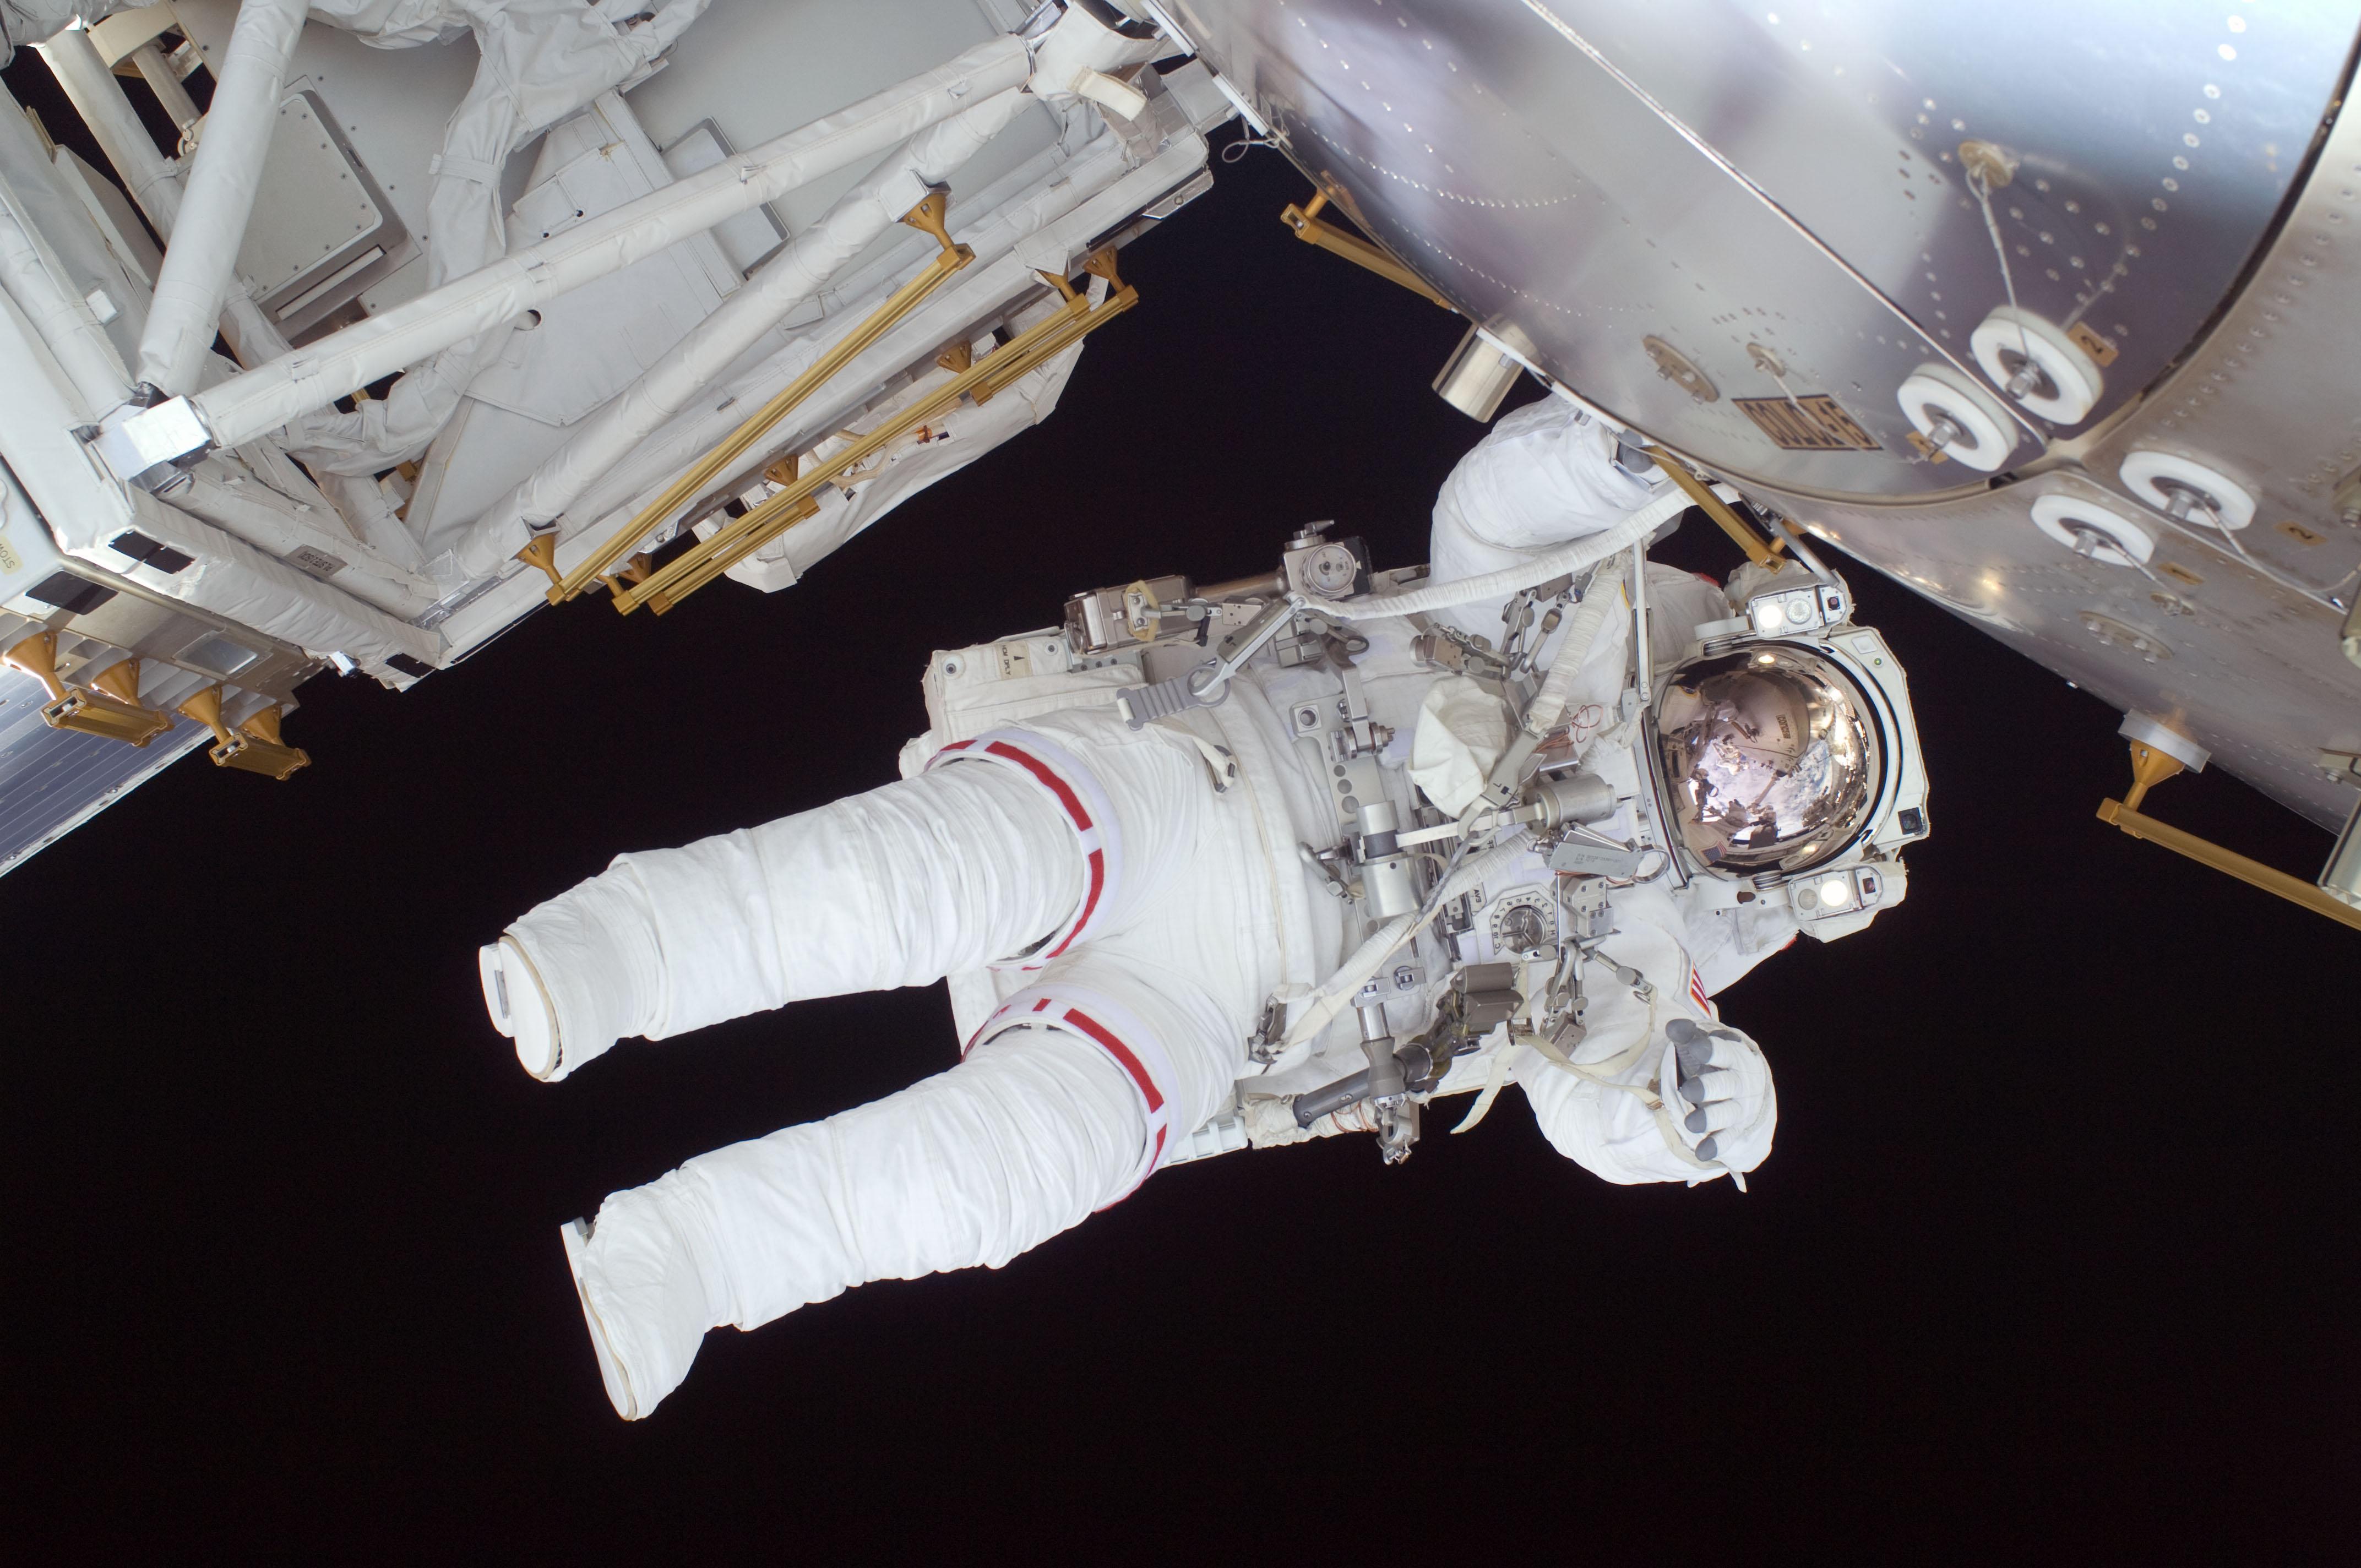 Nicole_Stott_participates_in_the_STS-128